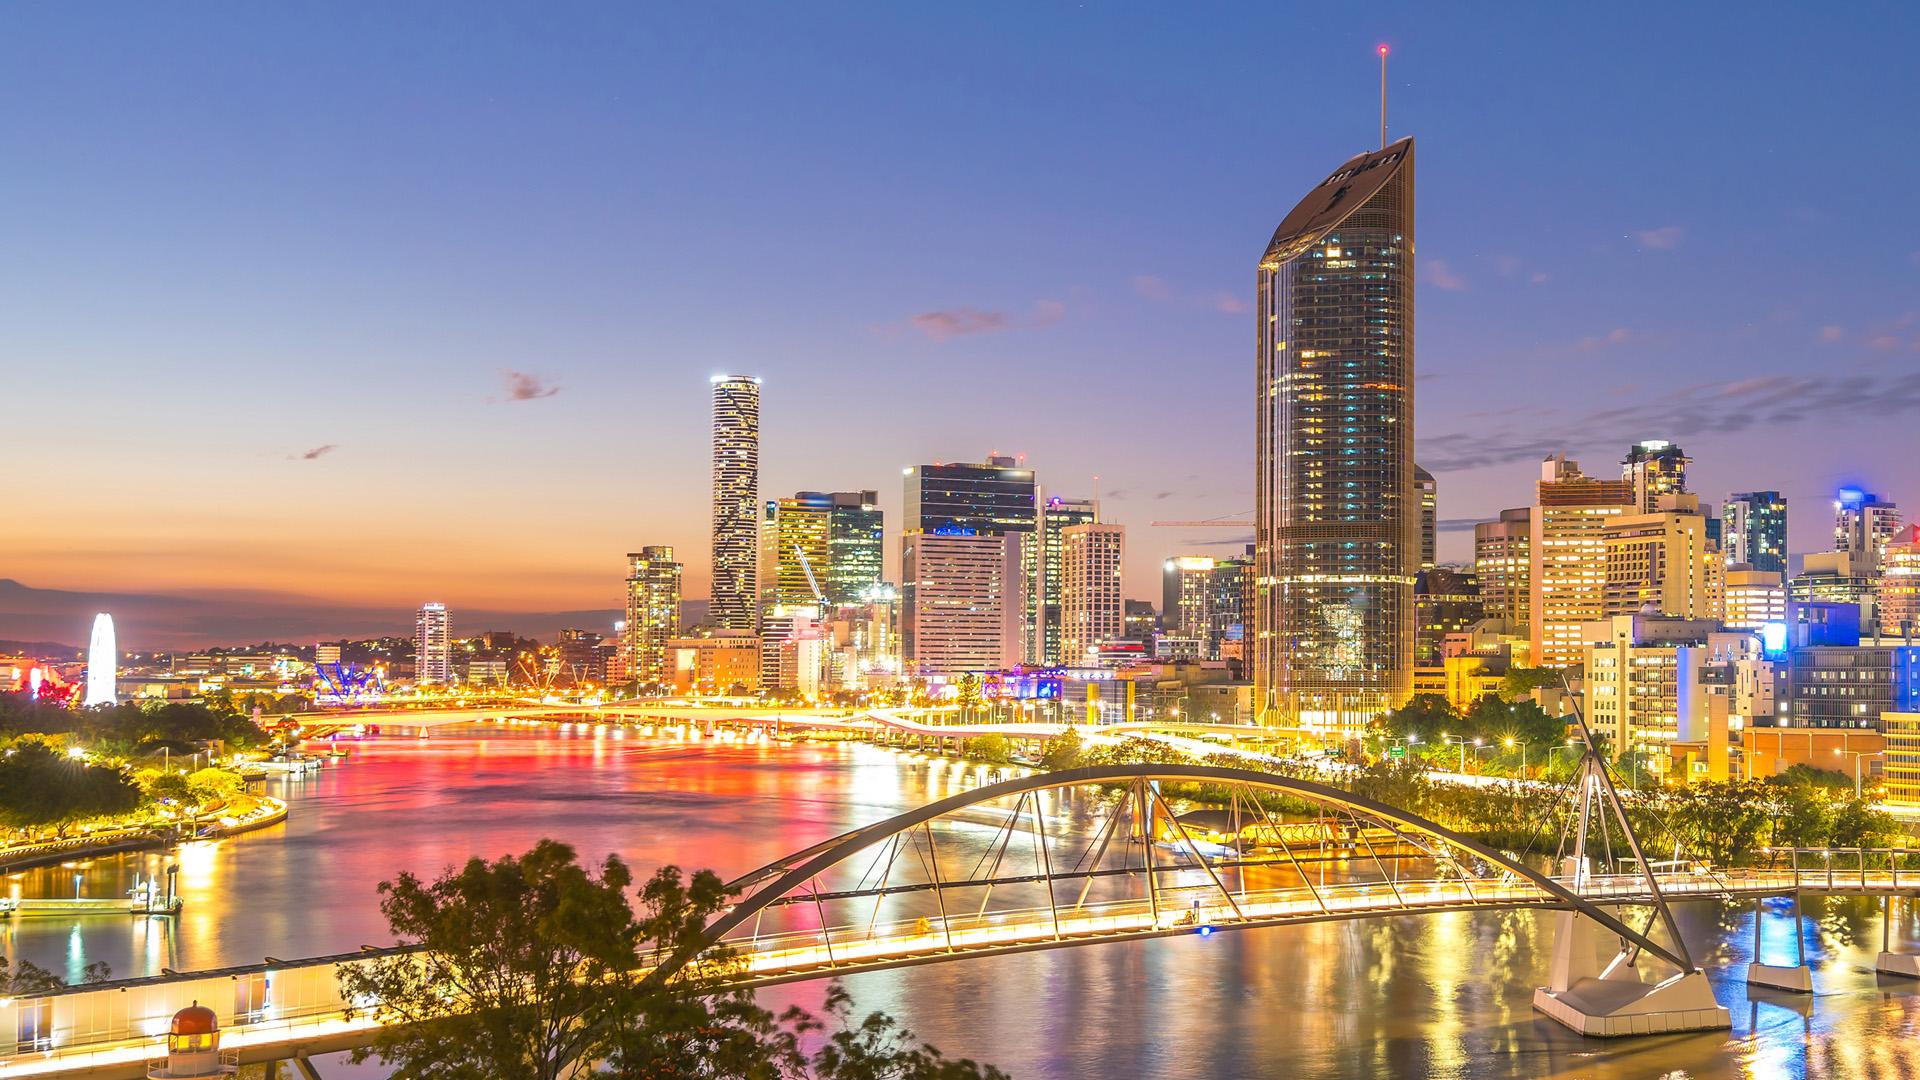 Brisbane city river at night